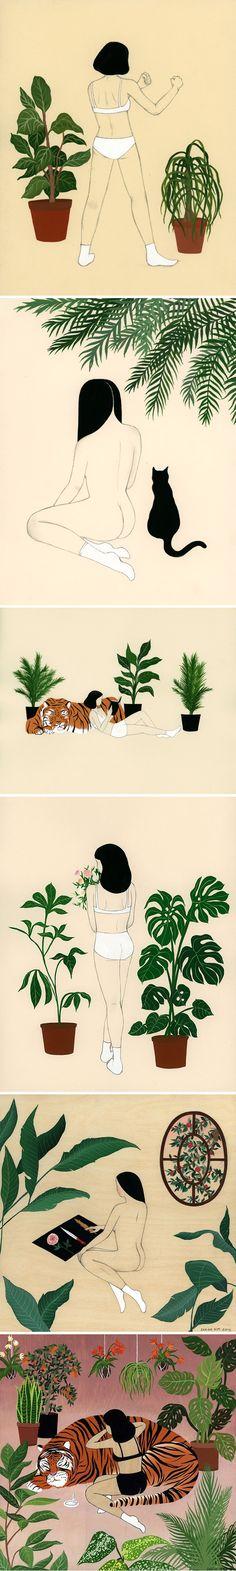 The Jealous Curator /// curated contemporary art  /// dan-ah kim